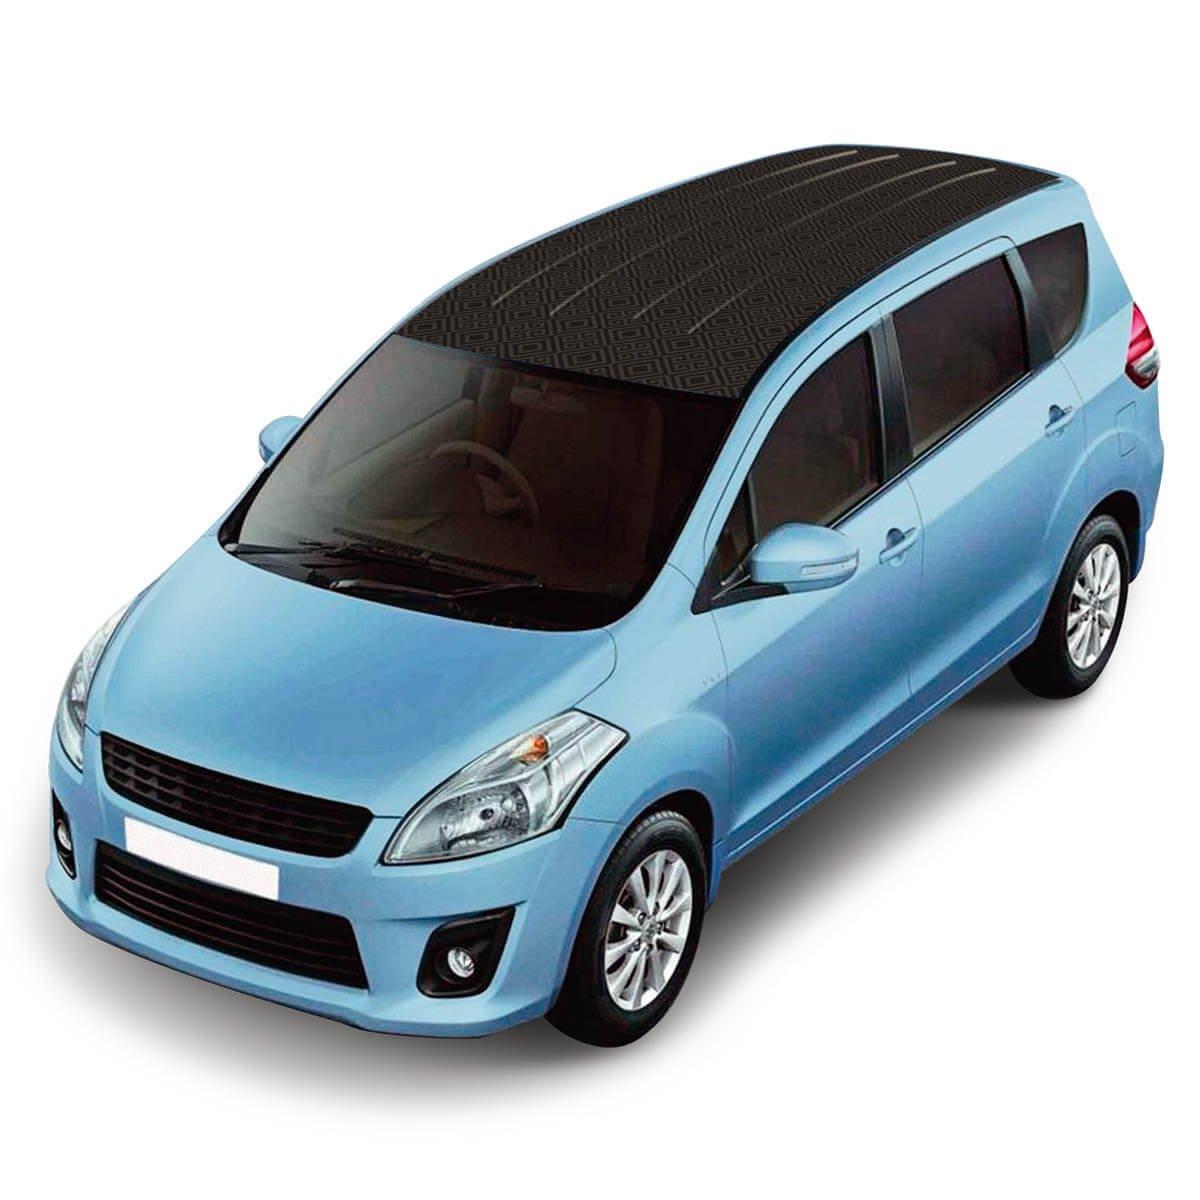 Autographix car body sticker wrap roof vinyl universal styling accessories amazon in car motorbike